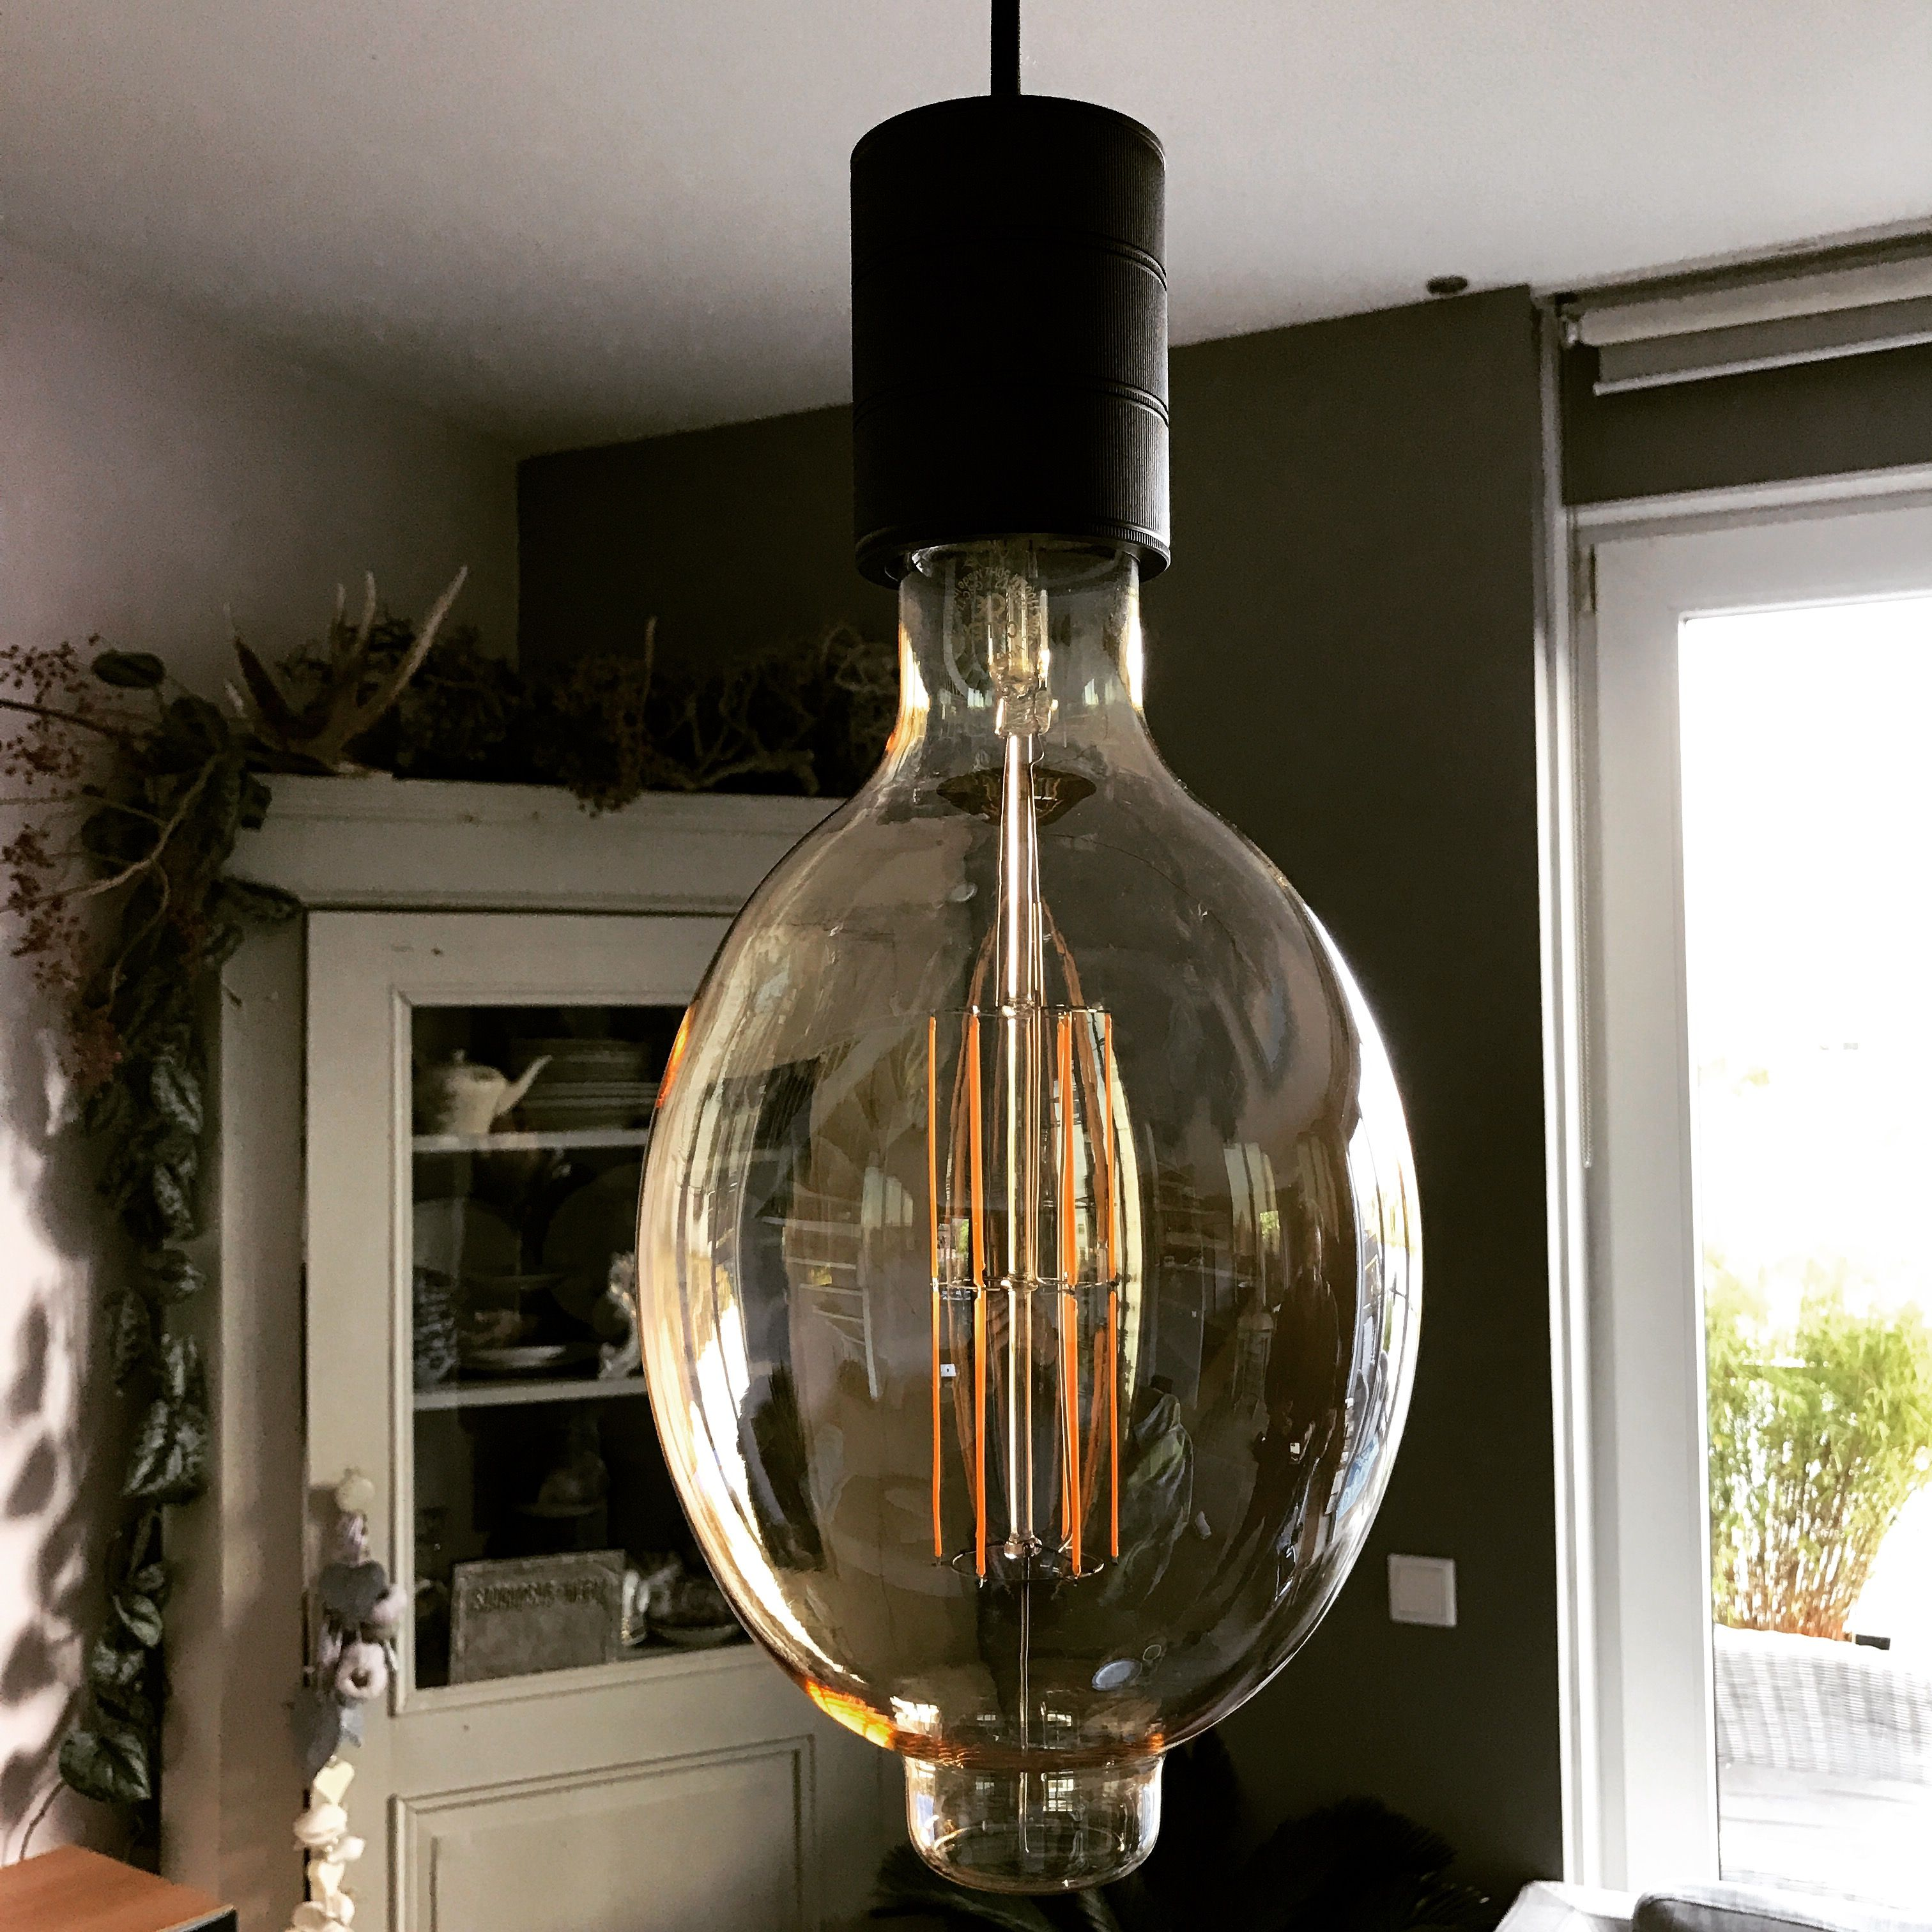 Calex Giant Xxl Colosseum In Combinatie Met E40 Industrial Black Snoerpendel Led Lampe Led Lampen